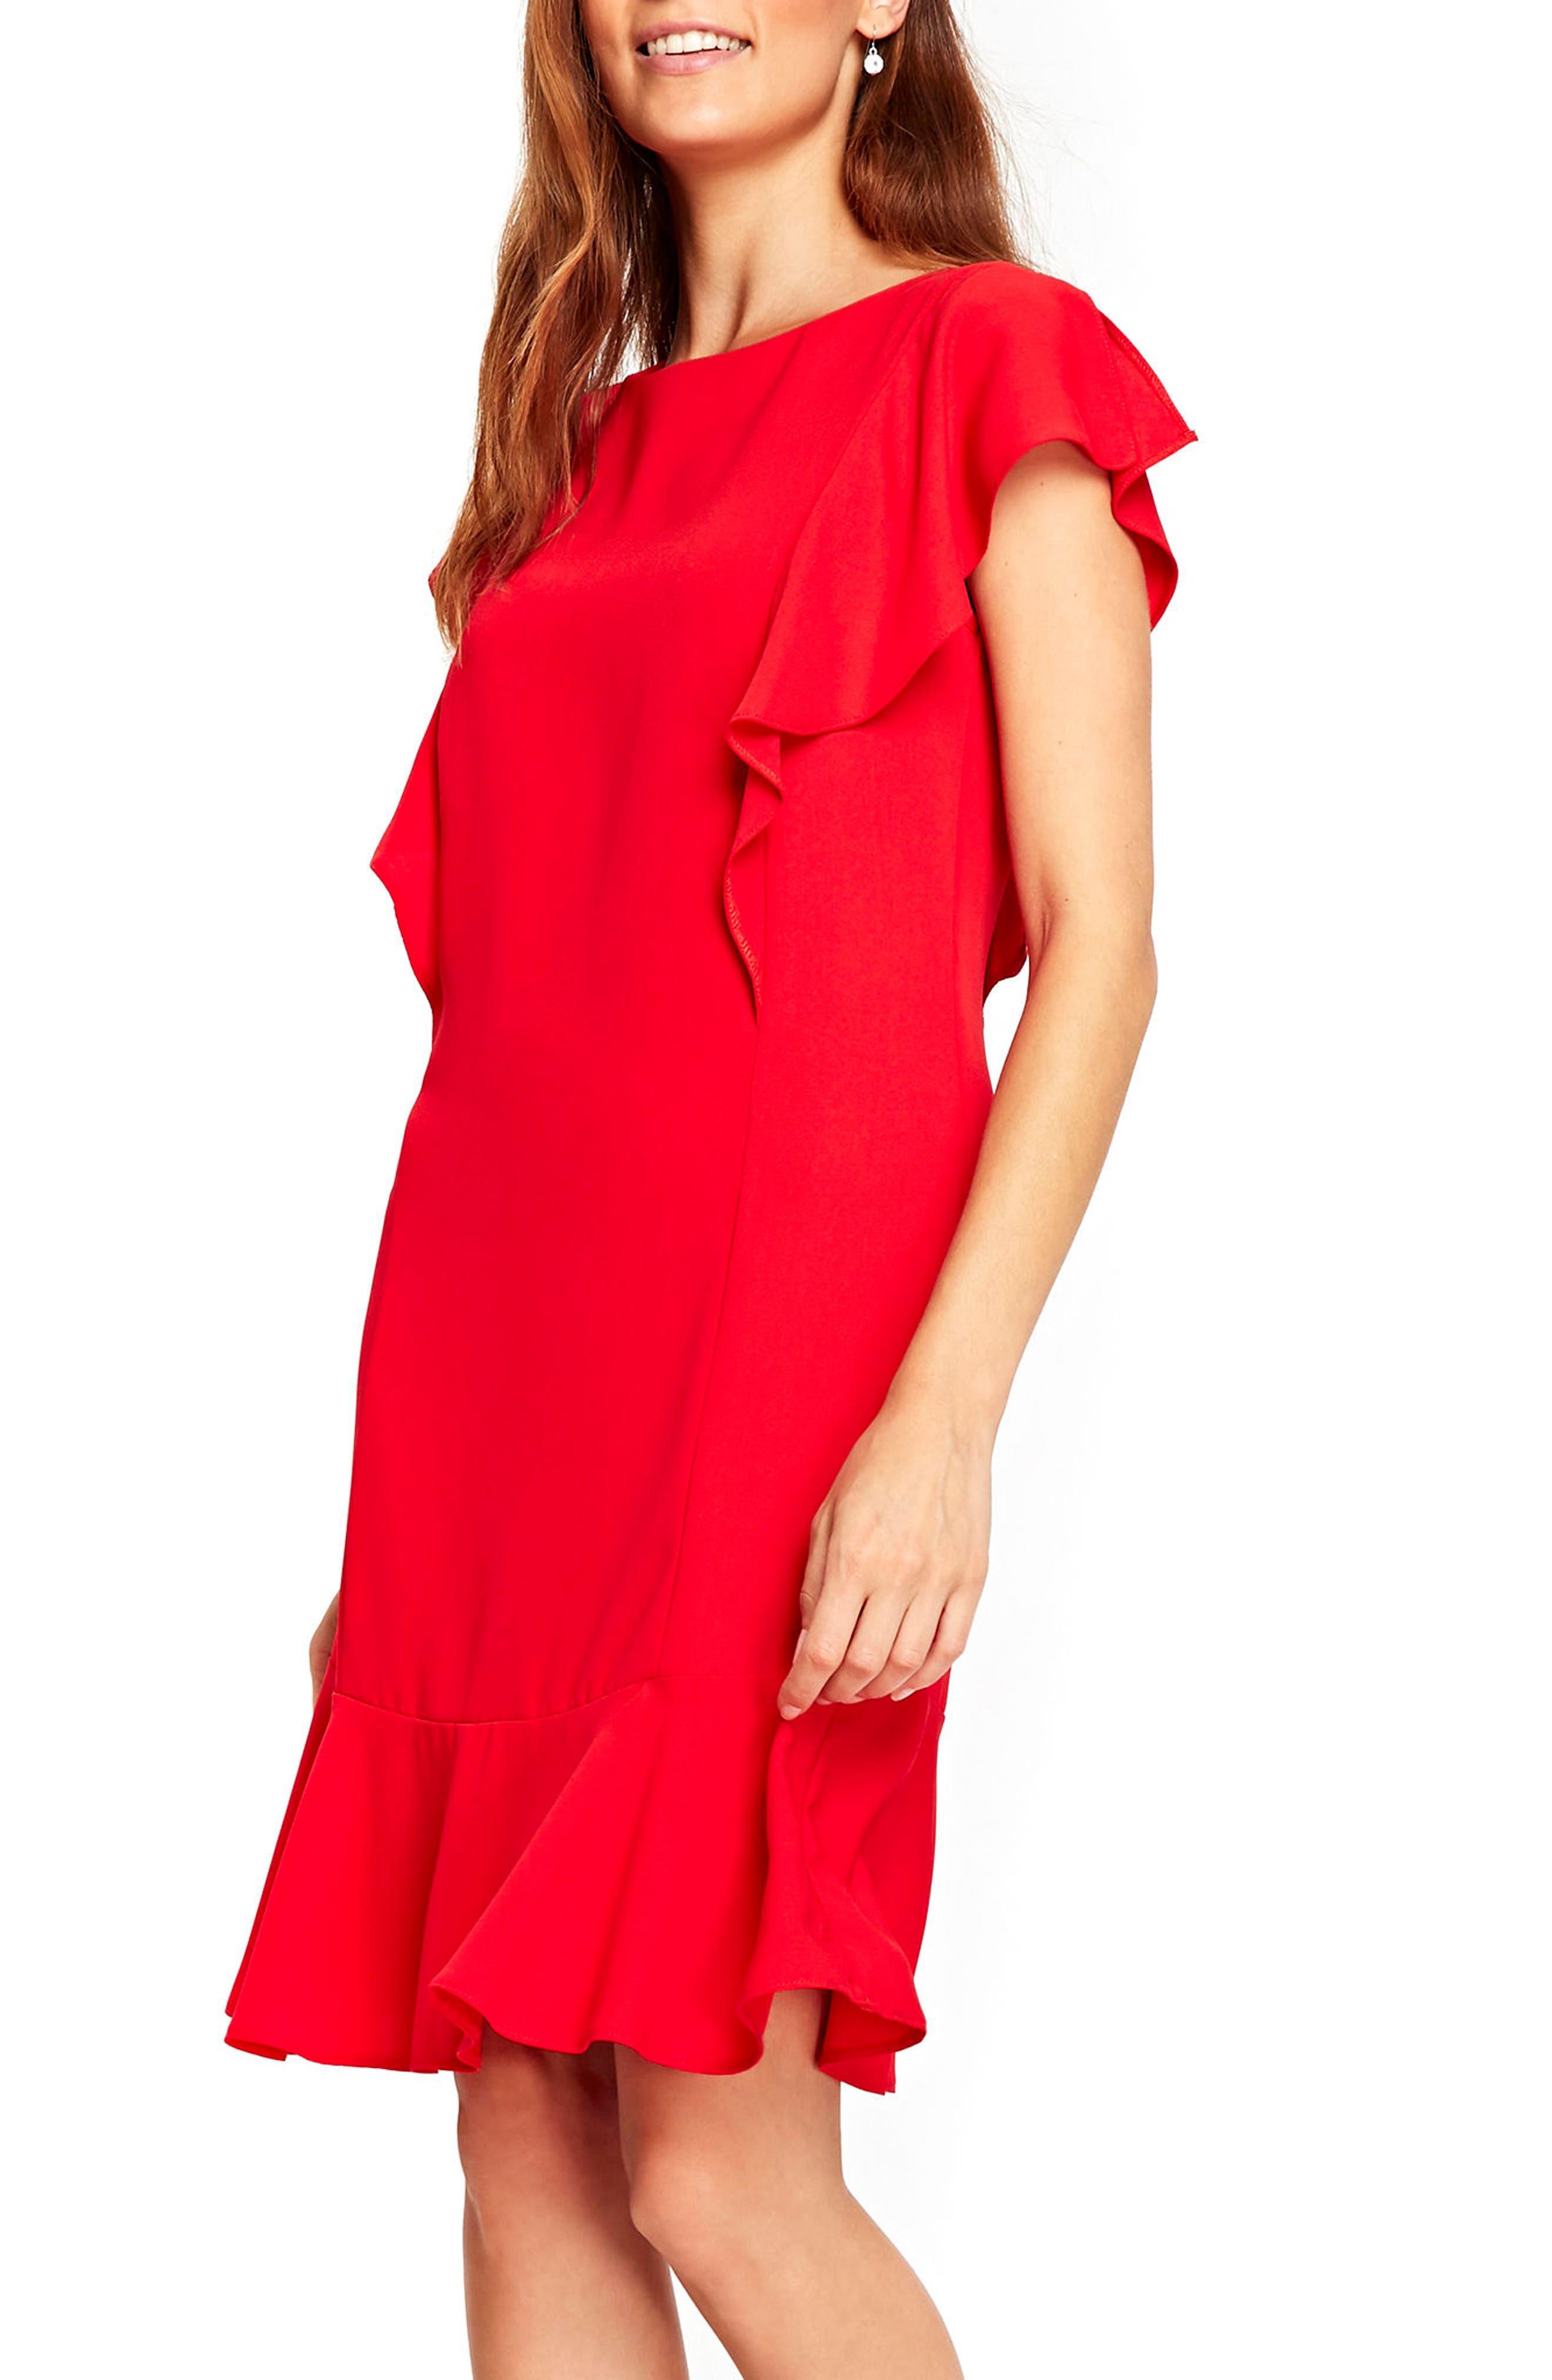 Alternate Image 1 Selected - Wallis Frill Sleeve Shift Dress